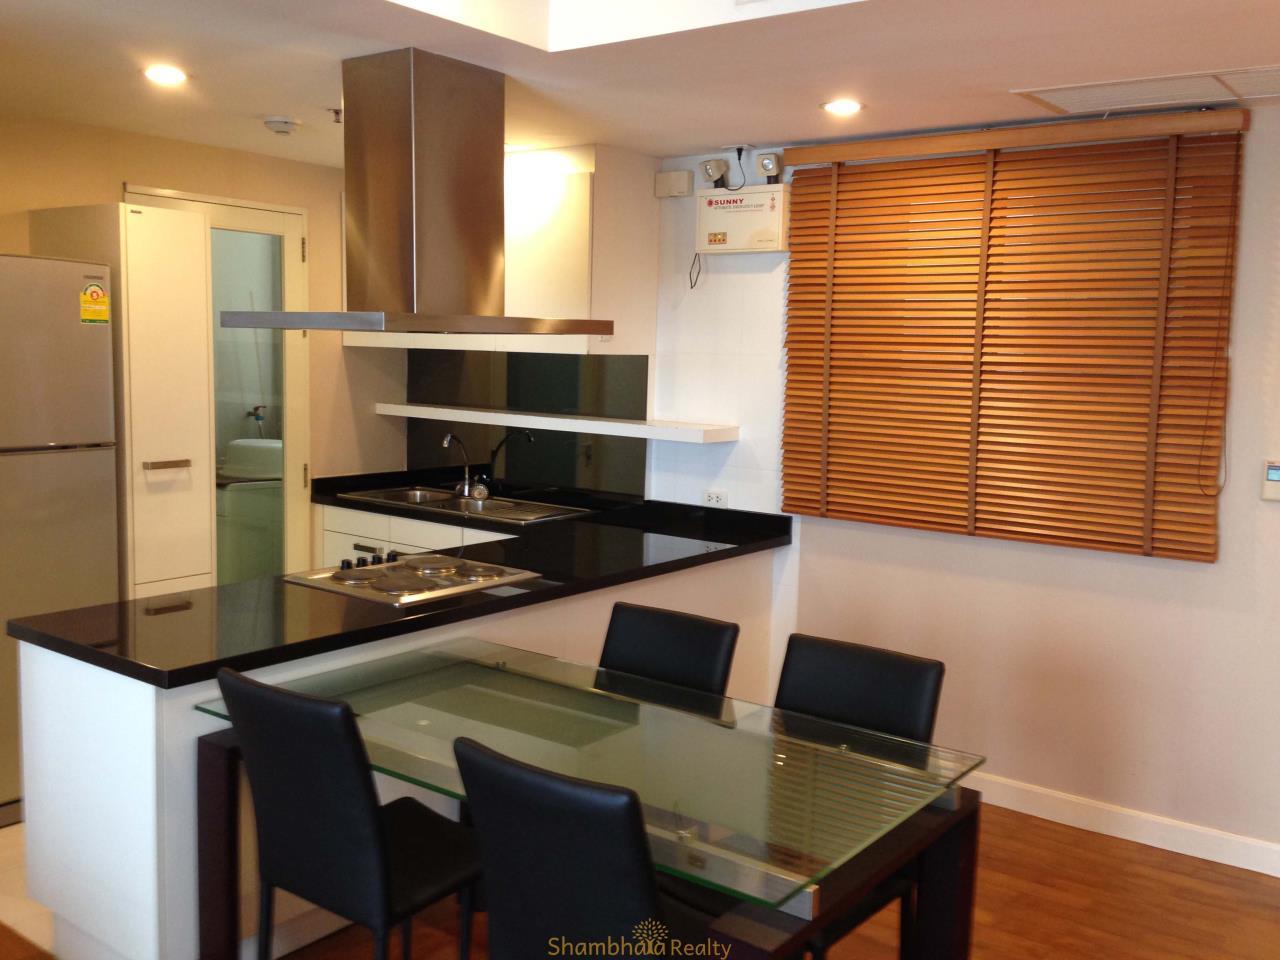 Shambhala Realty Agency's Baan Siri 31 Condominium for Sale in Sukhumvit 31 2